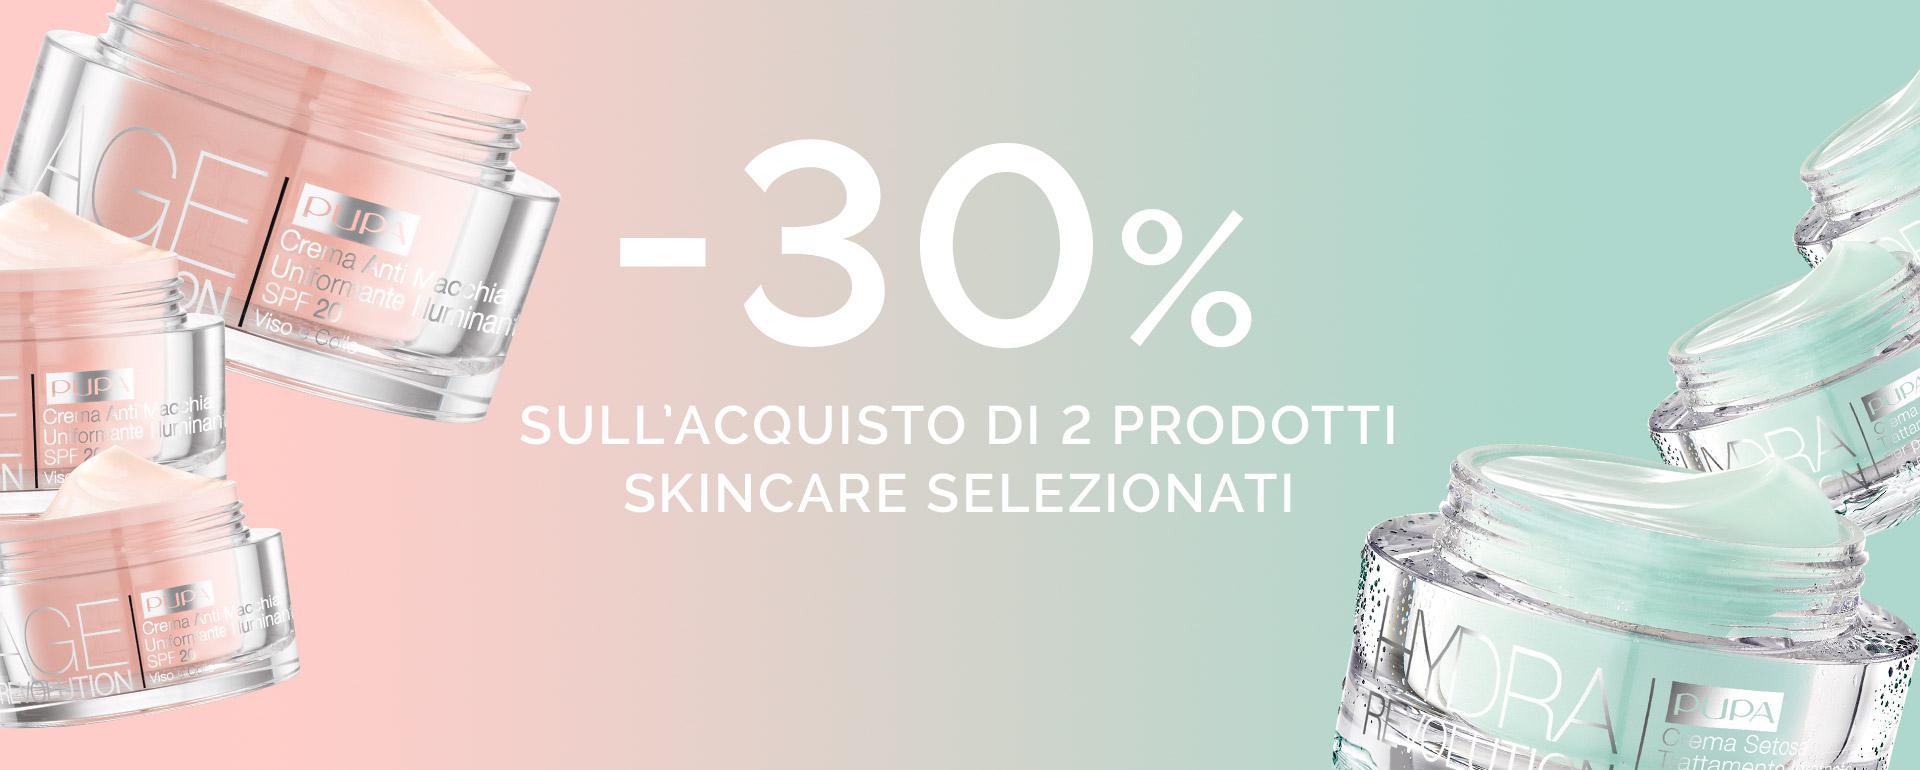 Skincare- PUPA Milano